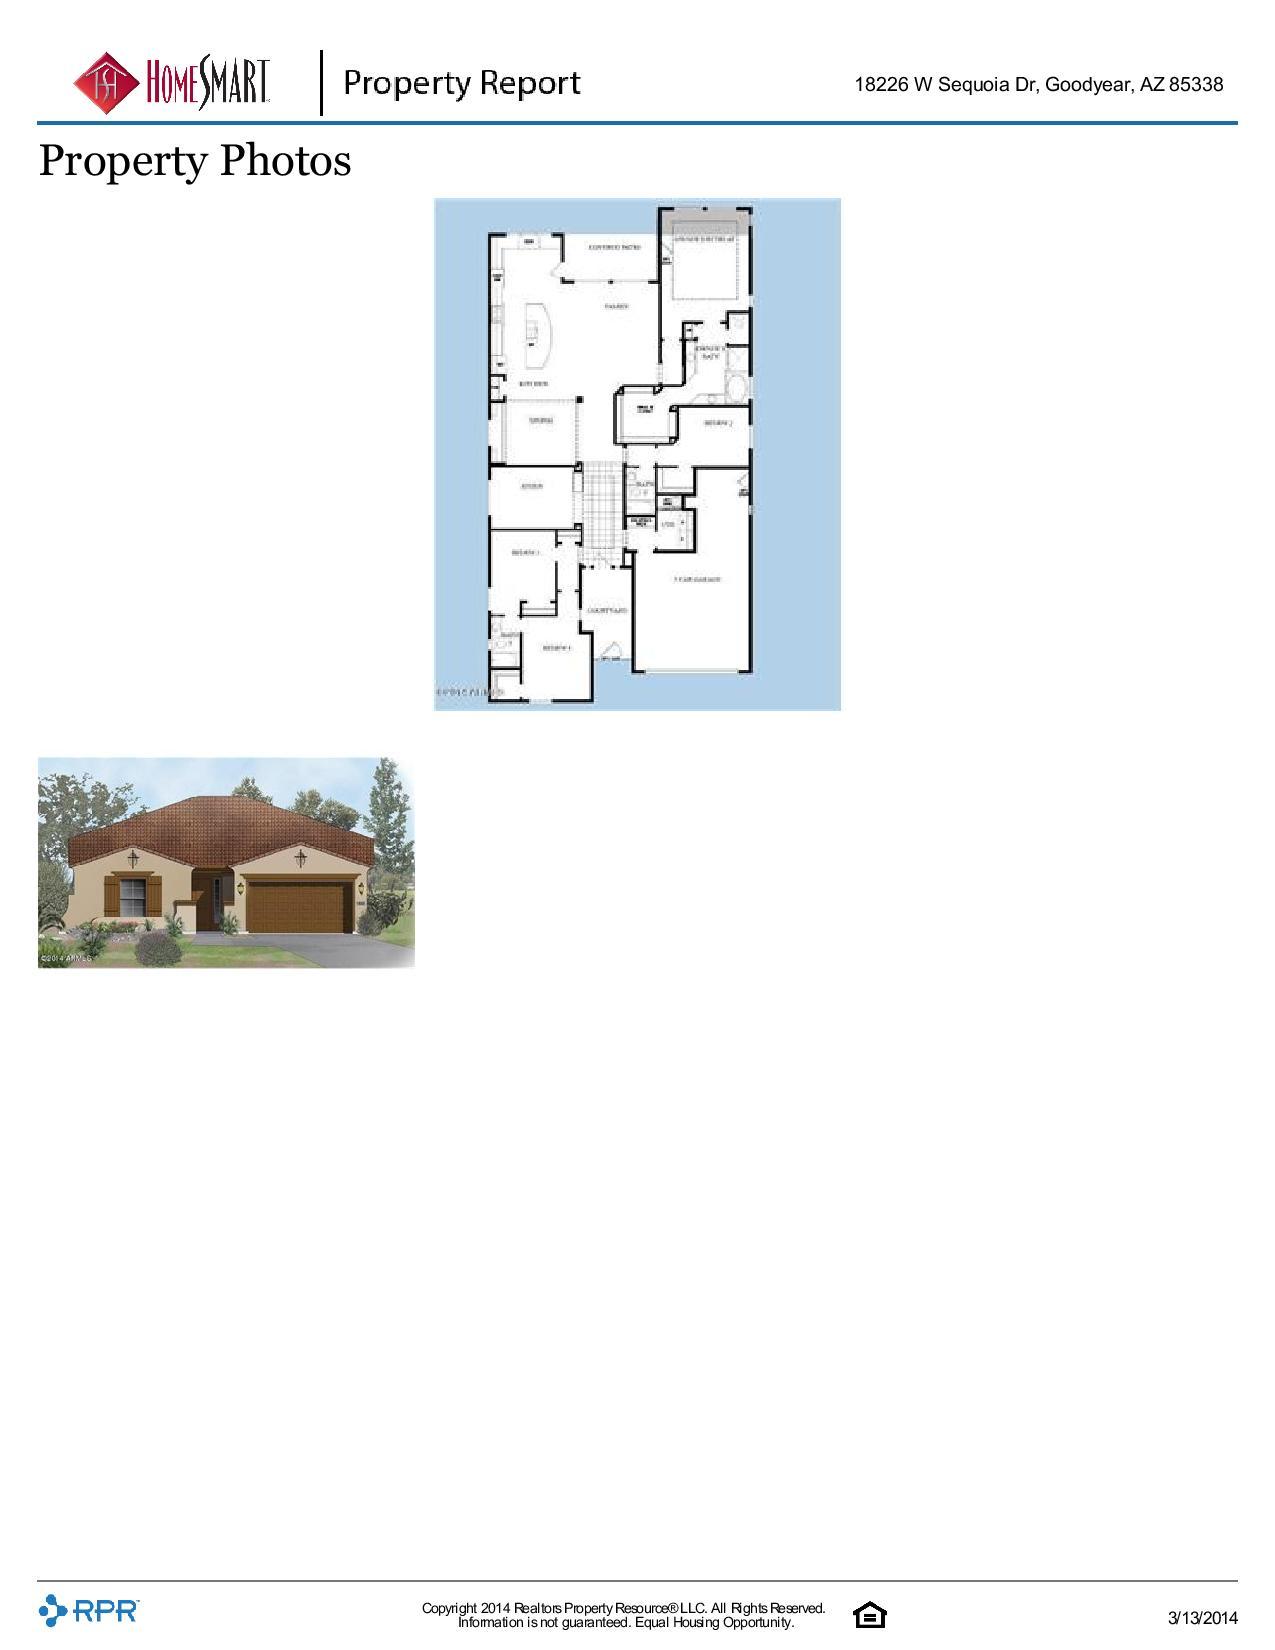 18226-W-Sequoia-Dr-Goodyear-AZ-85338-page-005